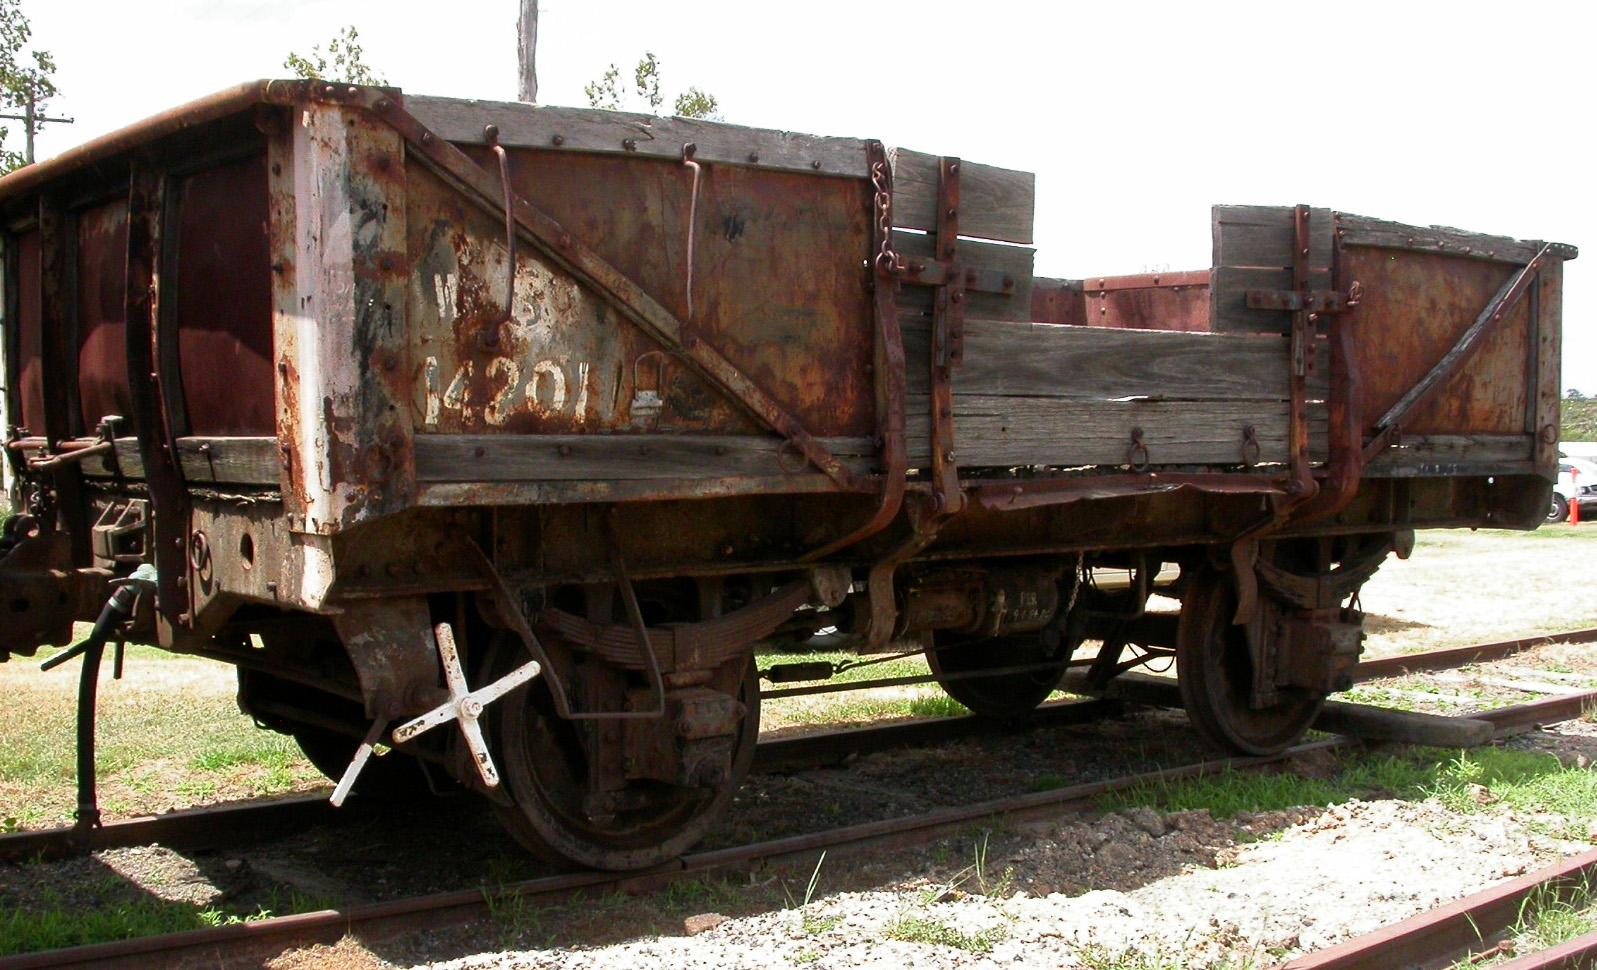 Pre restoration condition